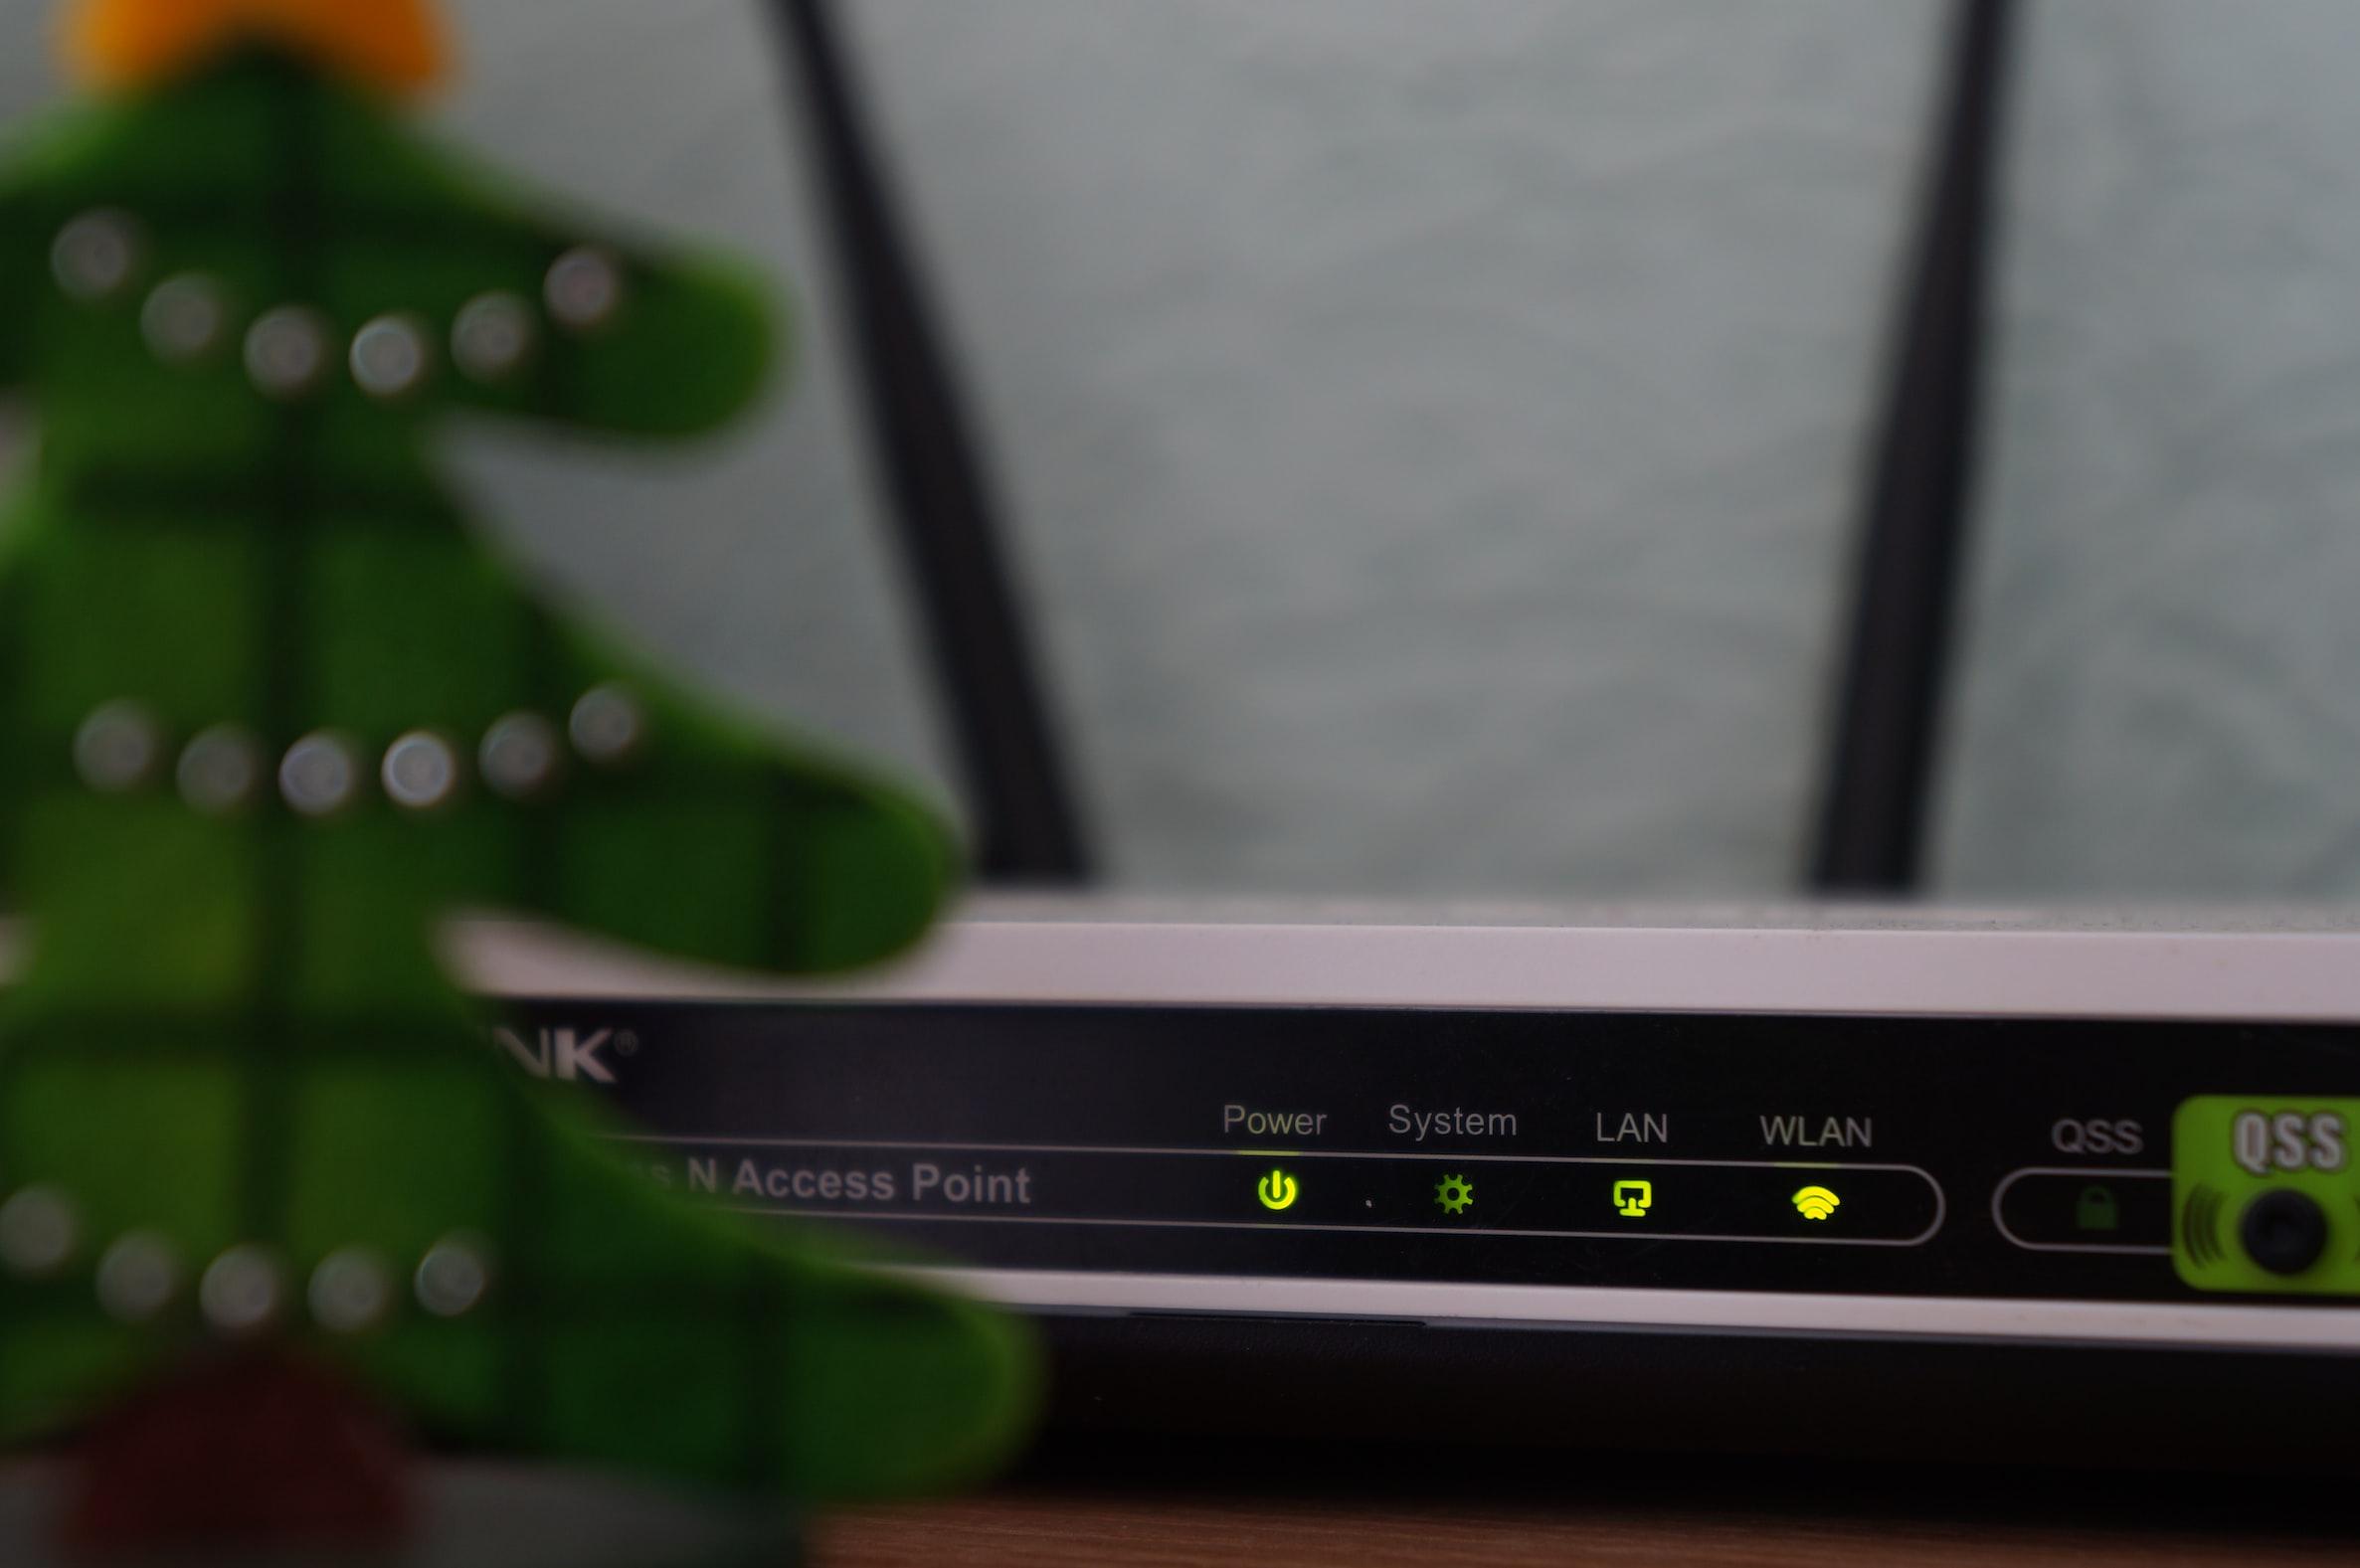 Broadband routers